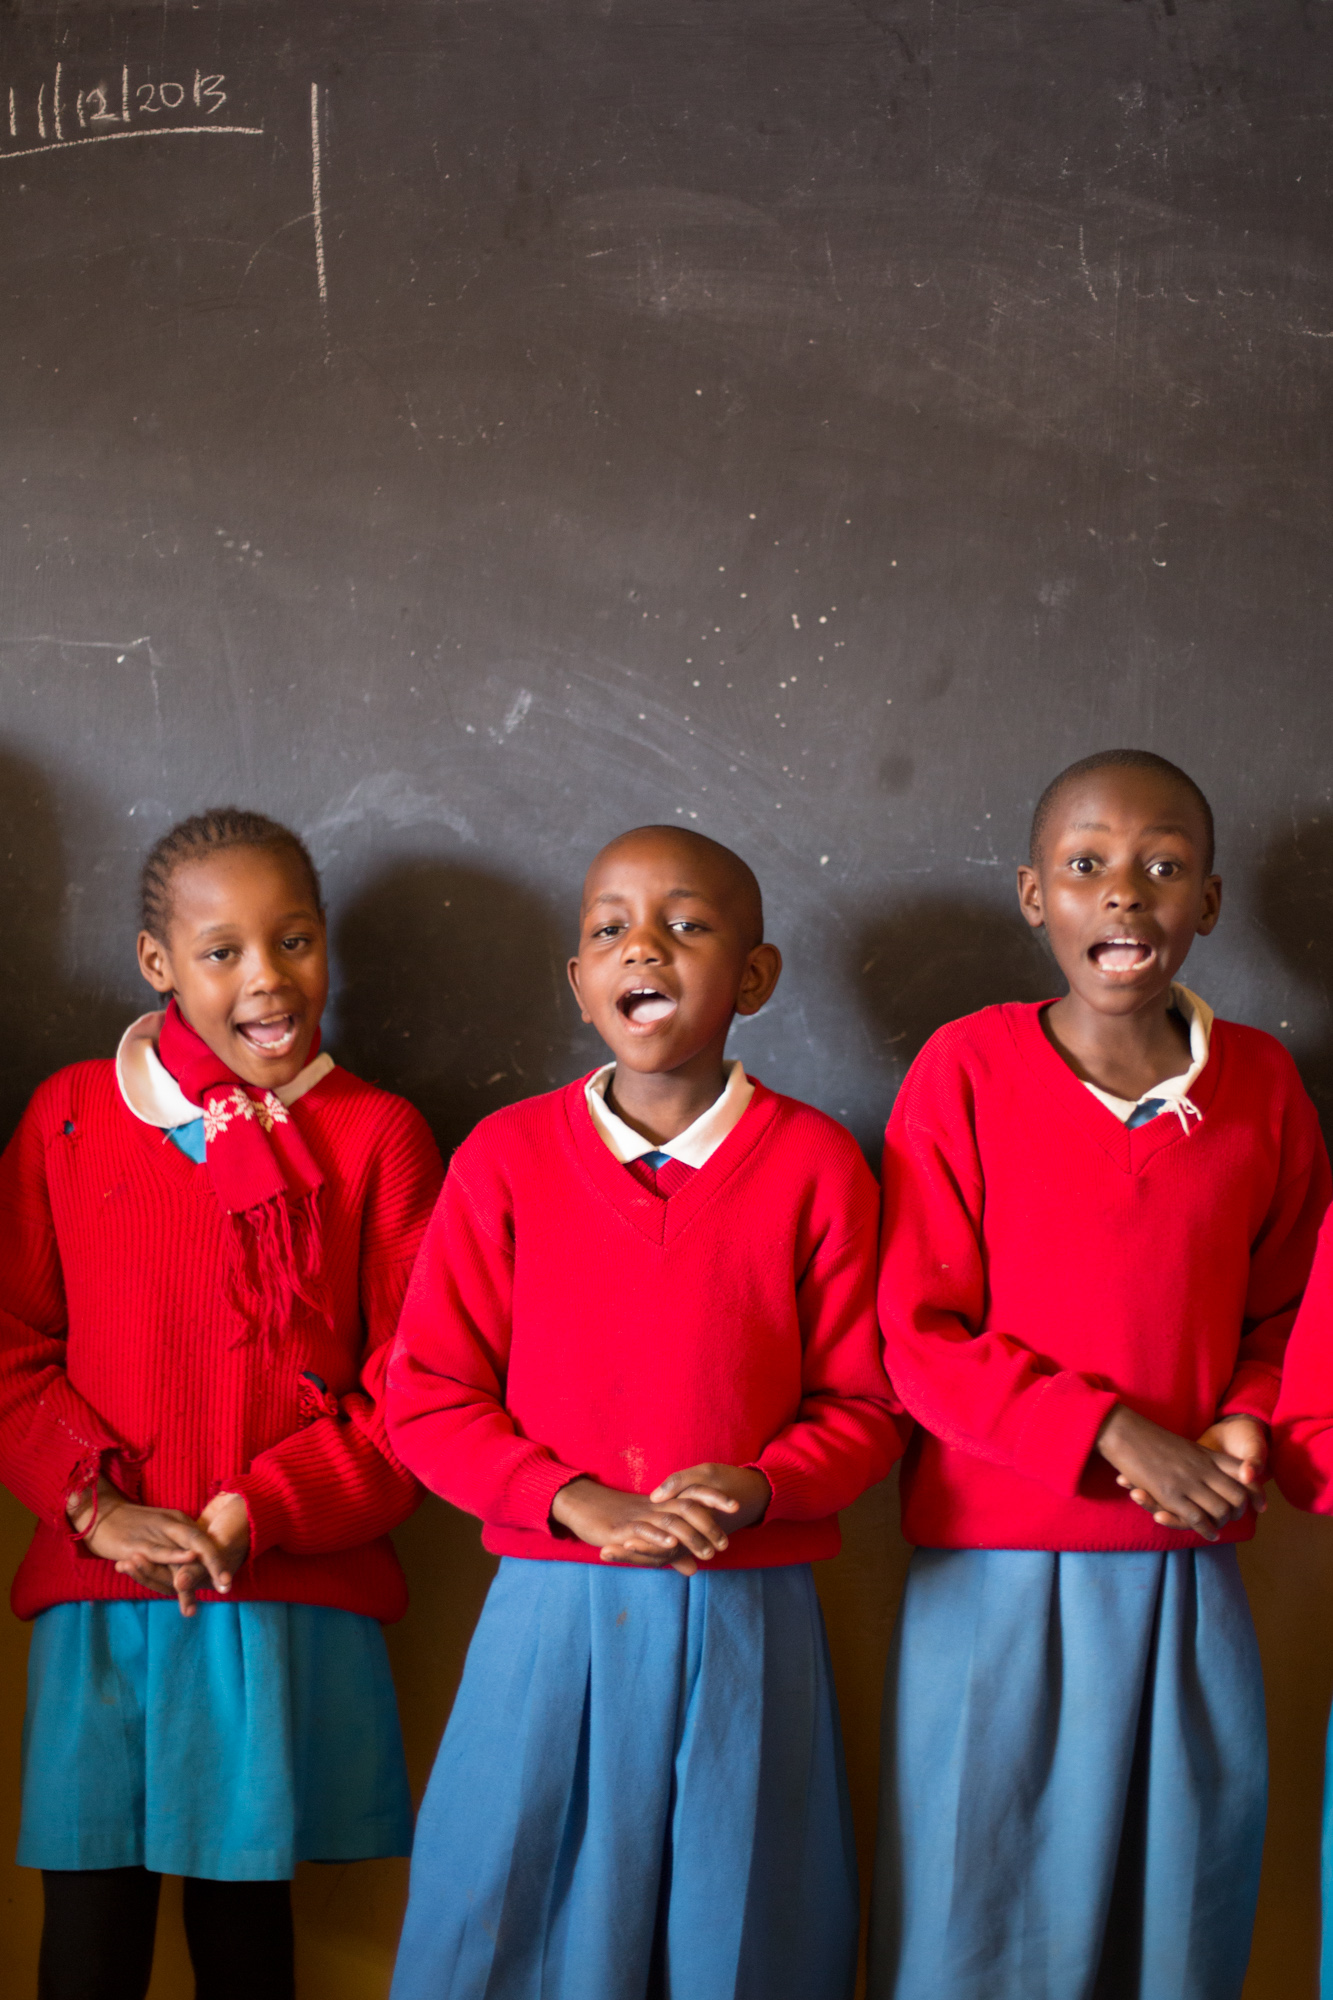 Kenya-Dec11-0995-2964373189-O.jpg